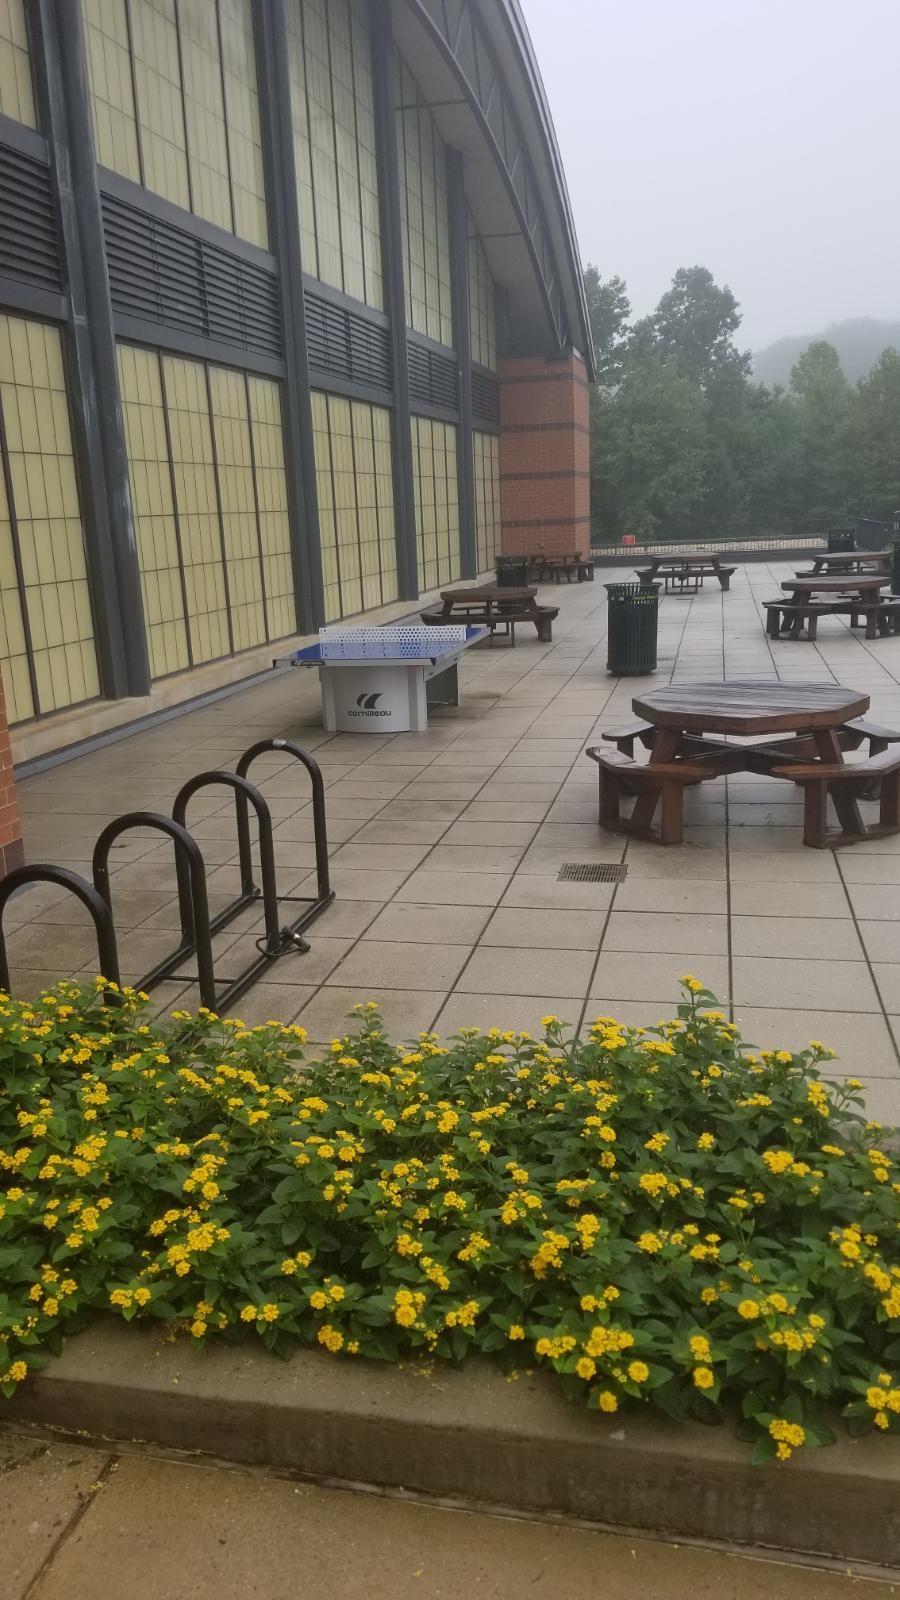 cornilleau 510 ping pong table george mason university